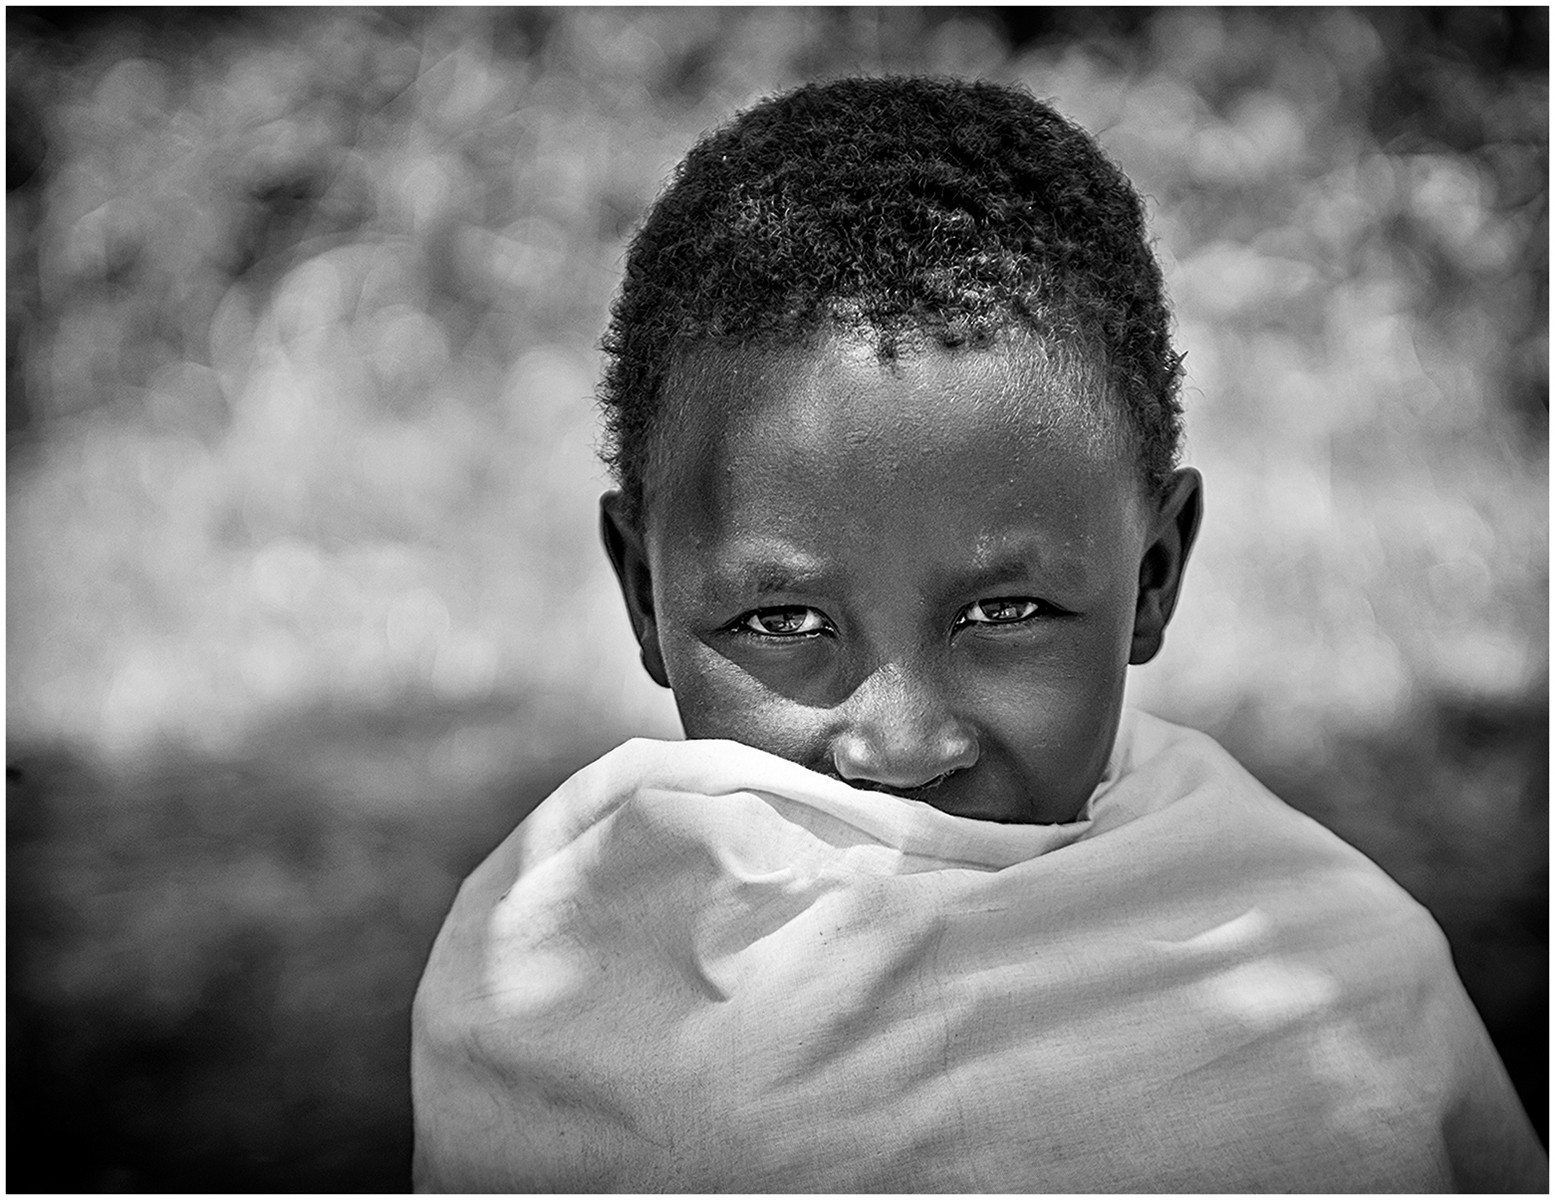 MONO - Massai Boy by Brendan Hinds (9 marks)